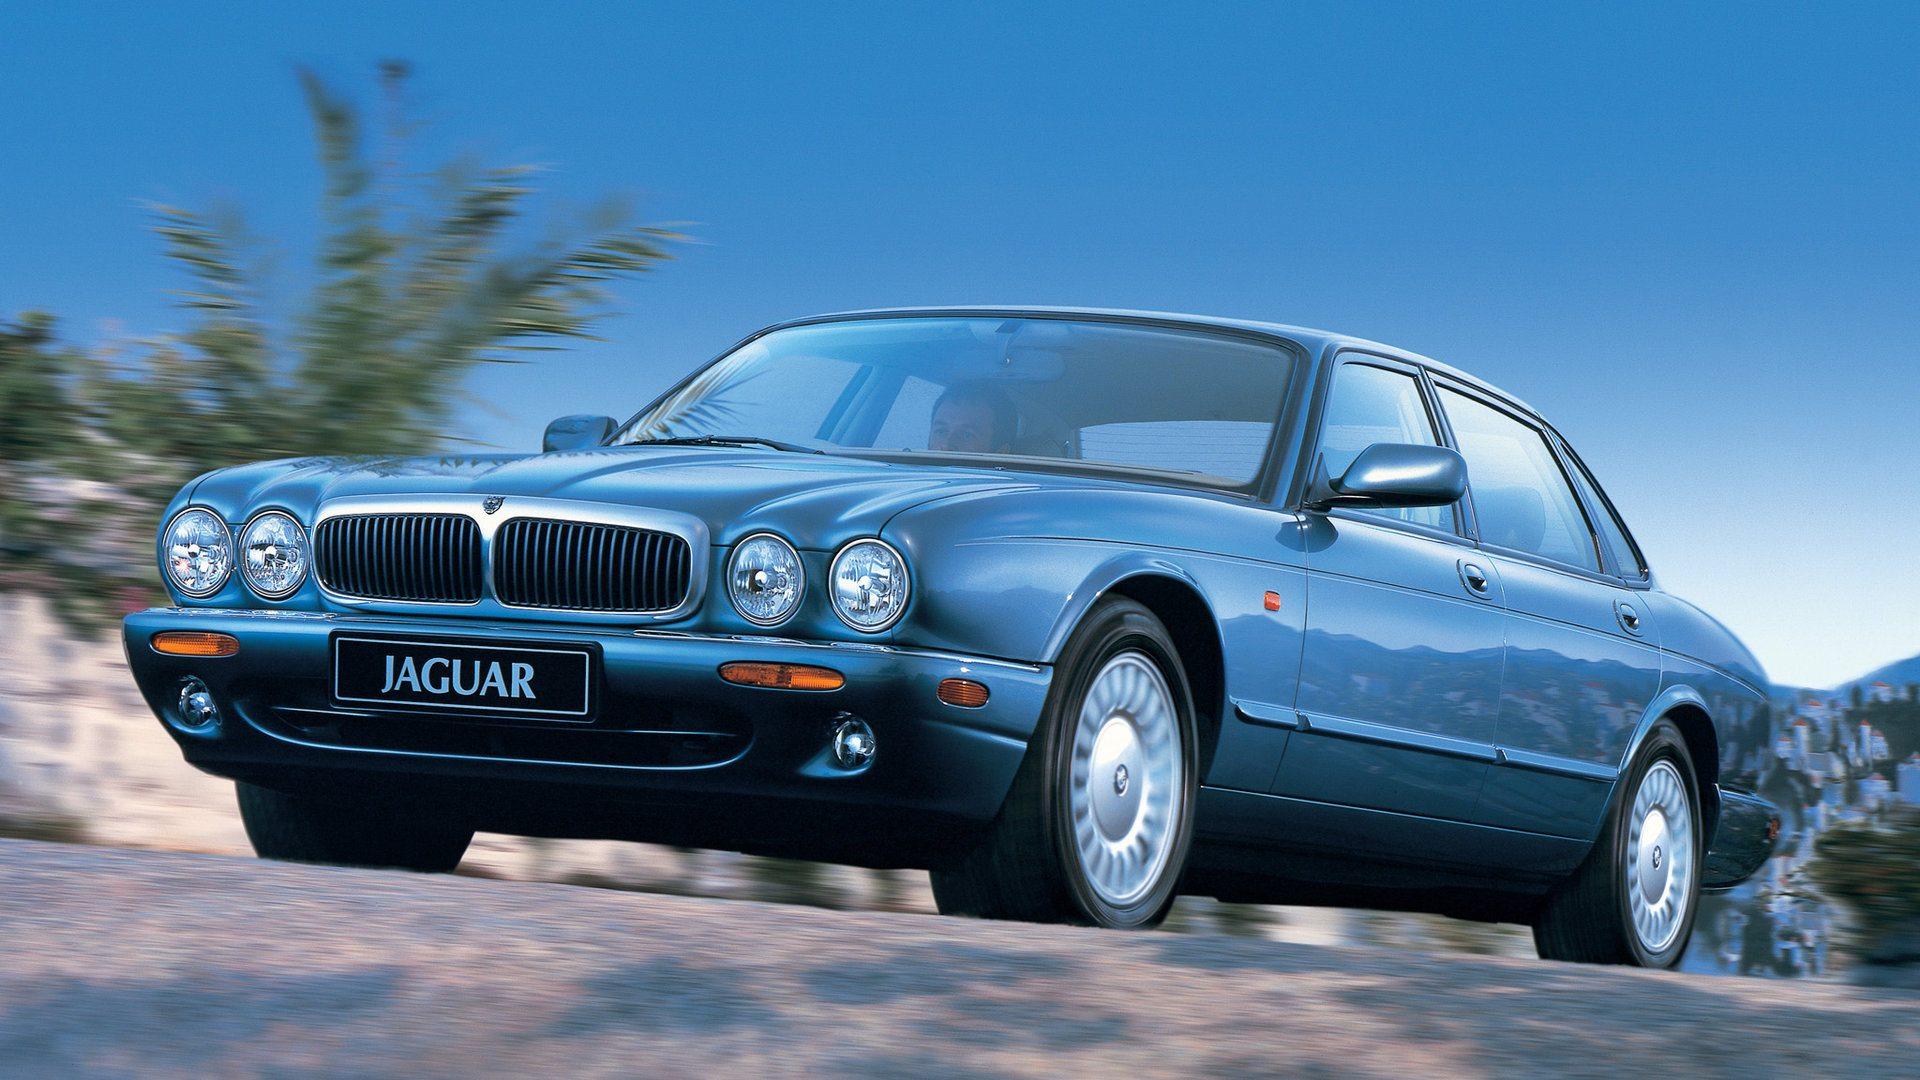 Top10 Gonzalo Jaguar XJ8 X300